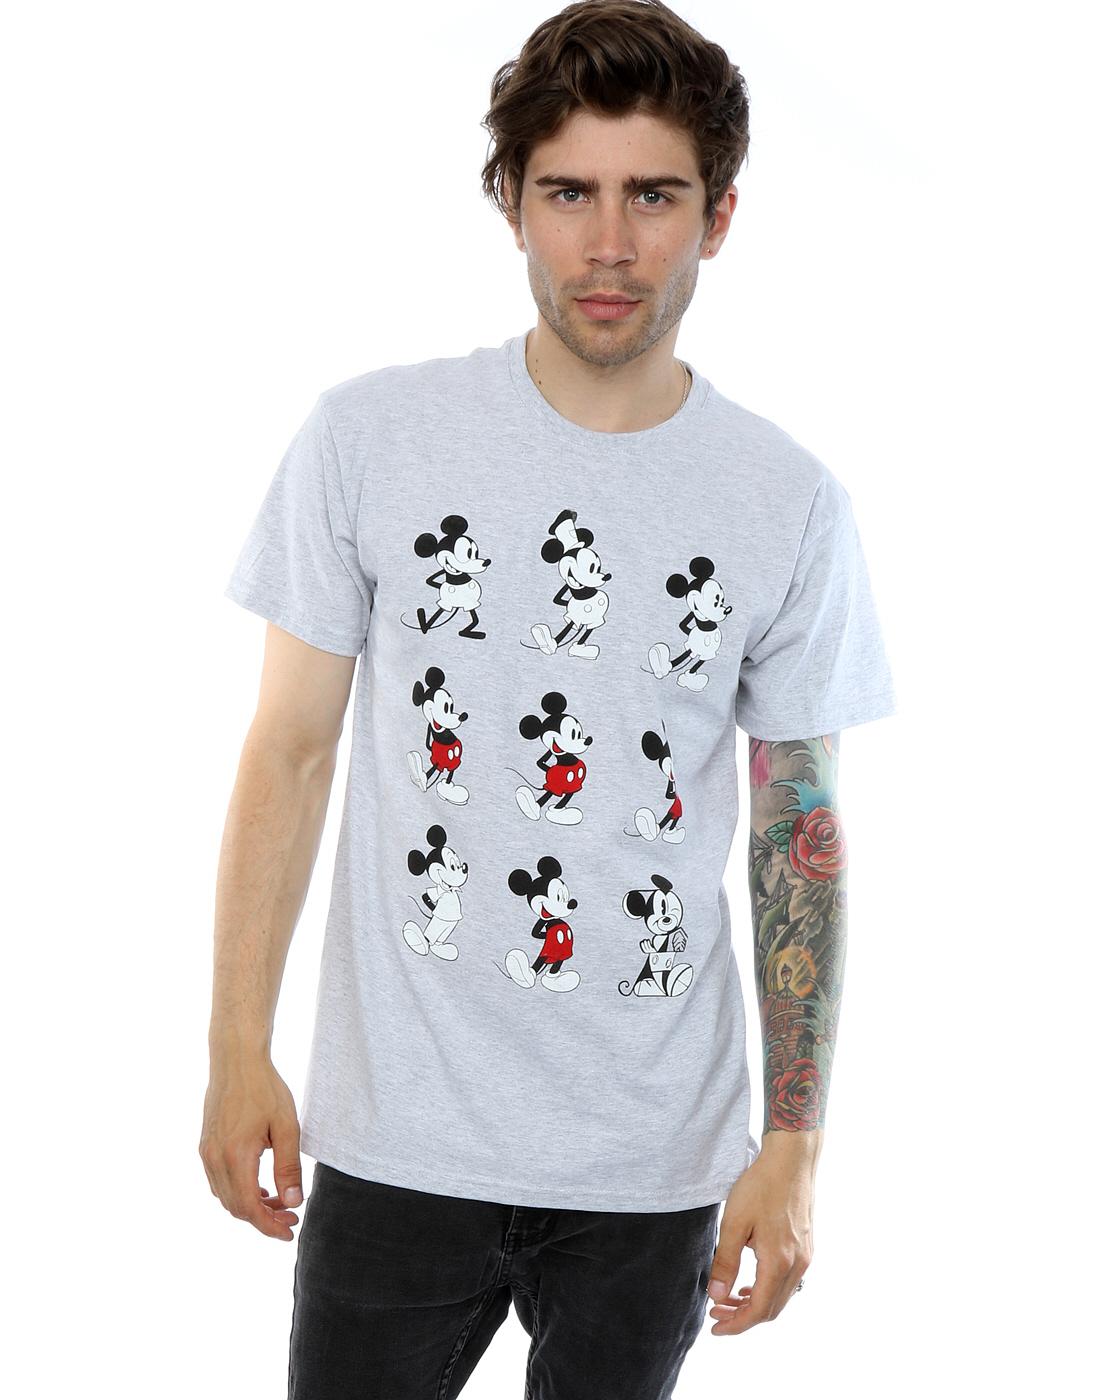 323bb38ab Disney Men's Mickey Mouse Evolution T-Shirt | eBay